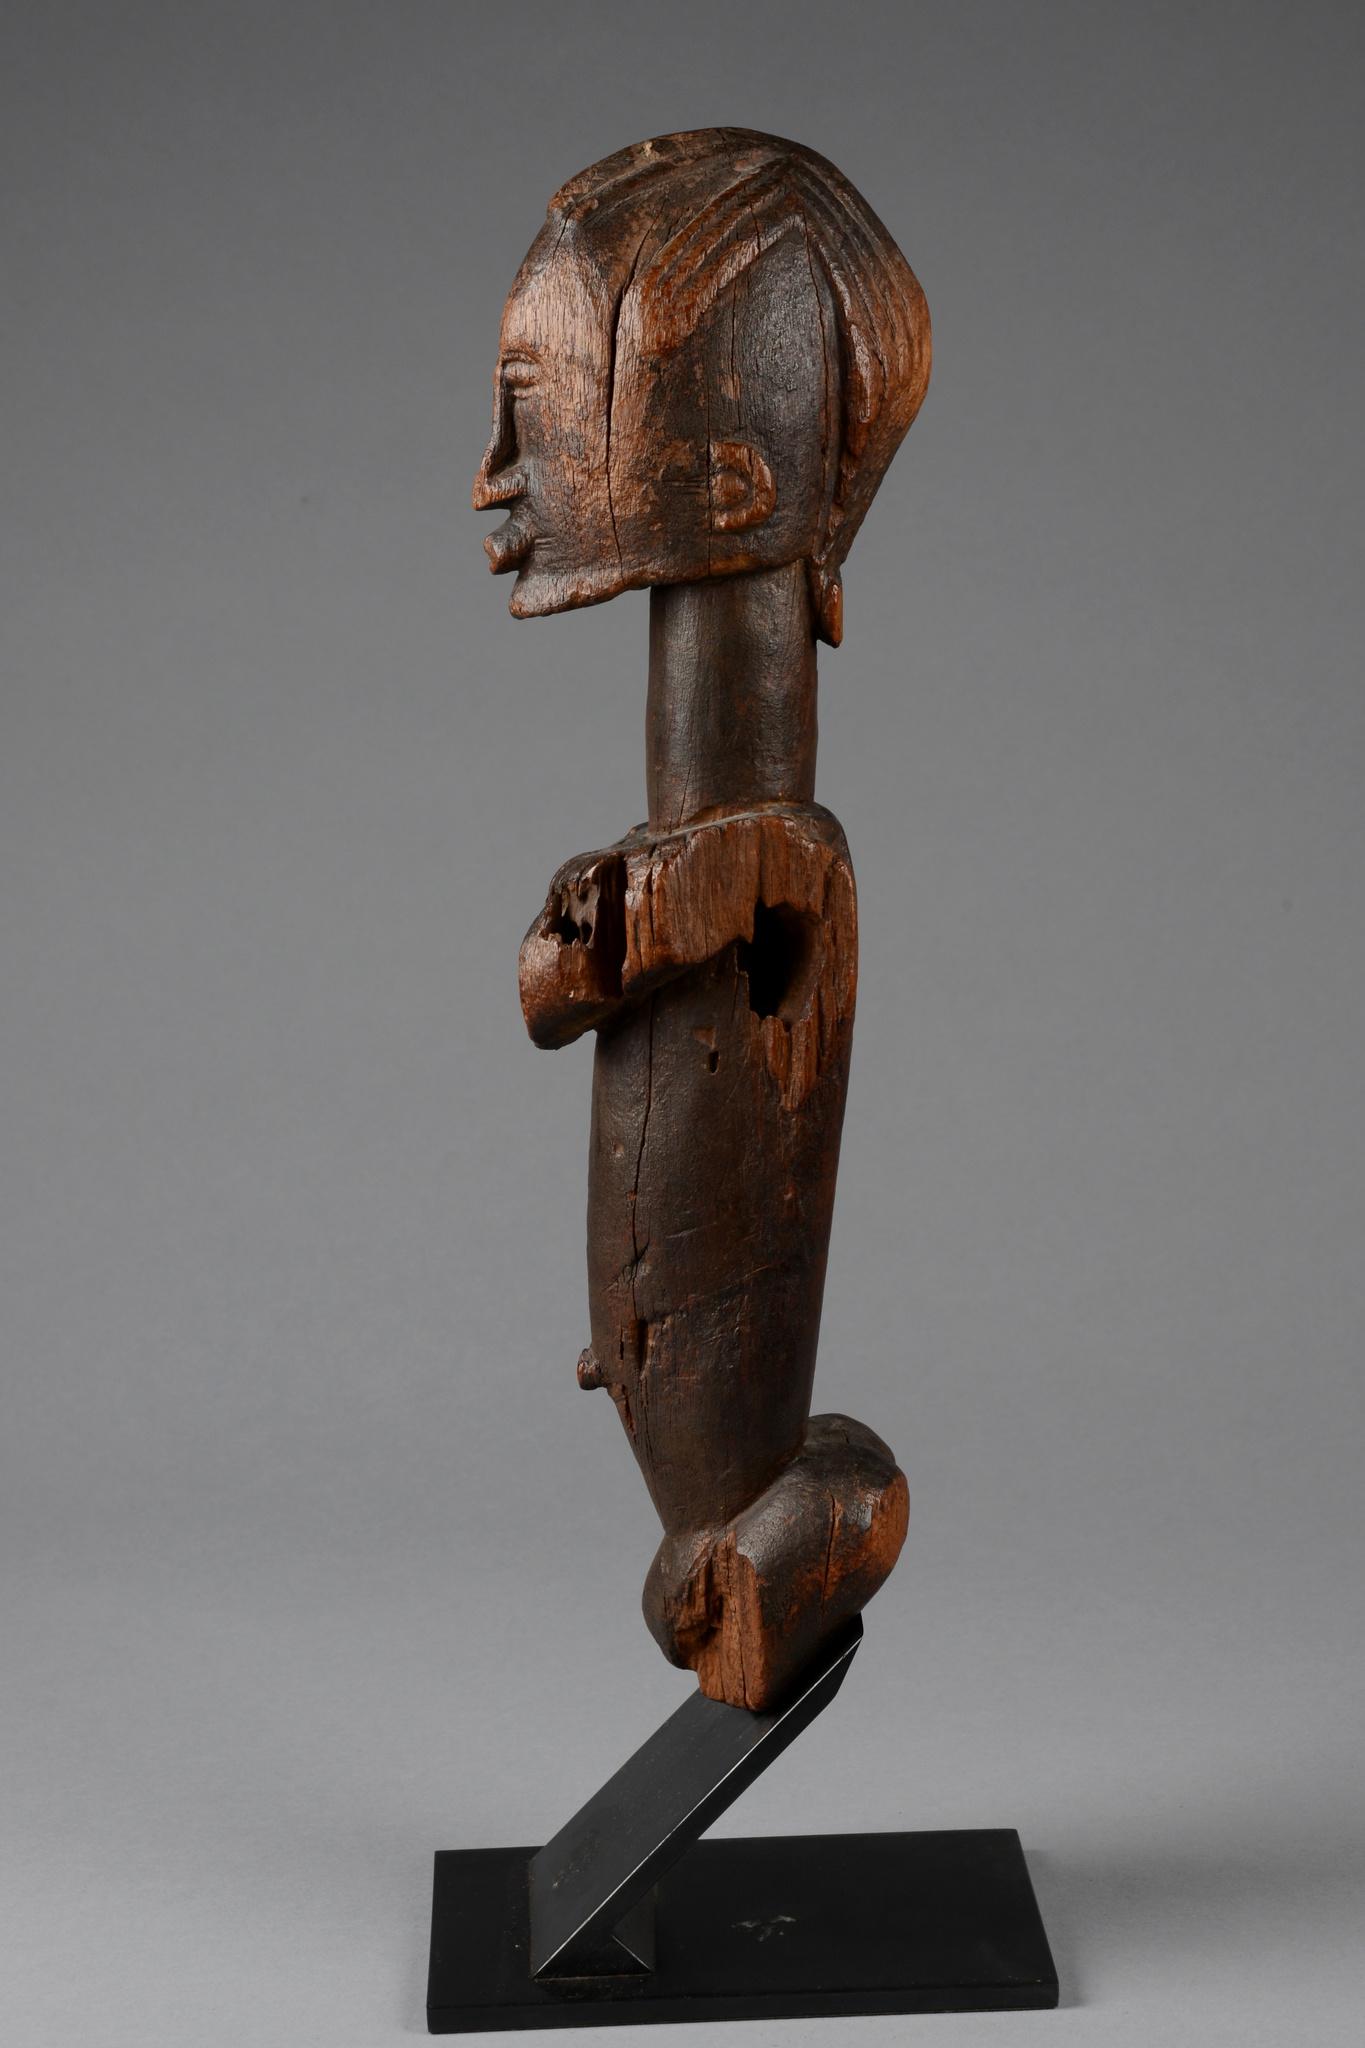 Torso of a female figure